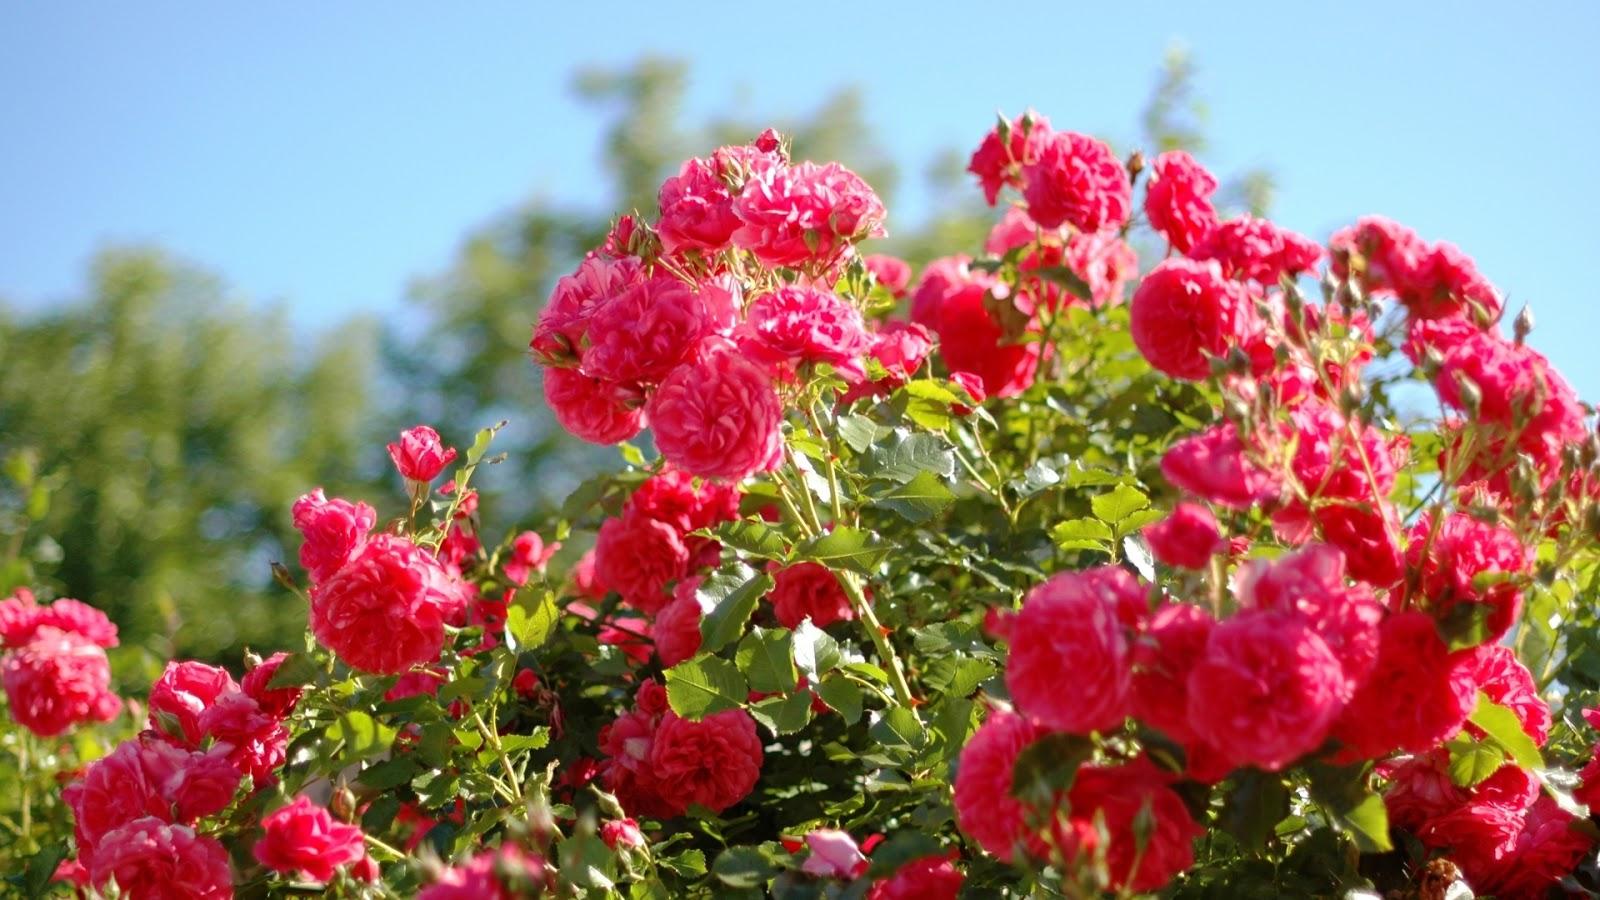 Rose Flower Garden Wallpaper - Flower Beautiful Full Hd , HD Wallpaper & Backgrounds